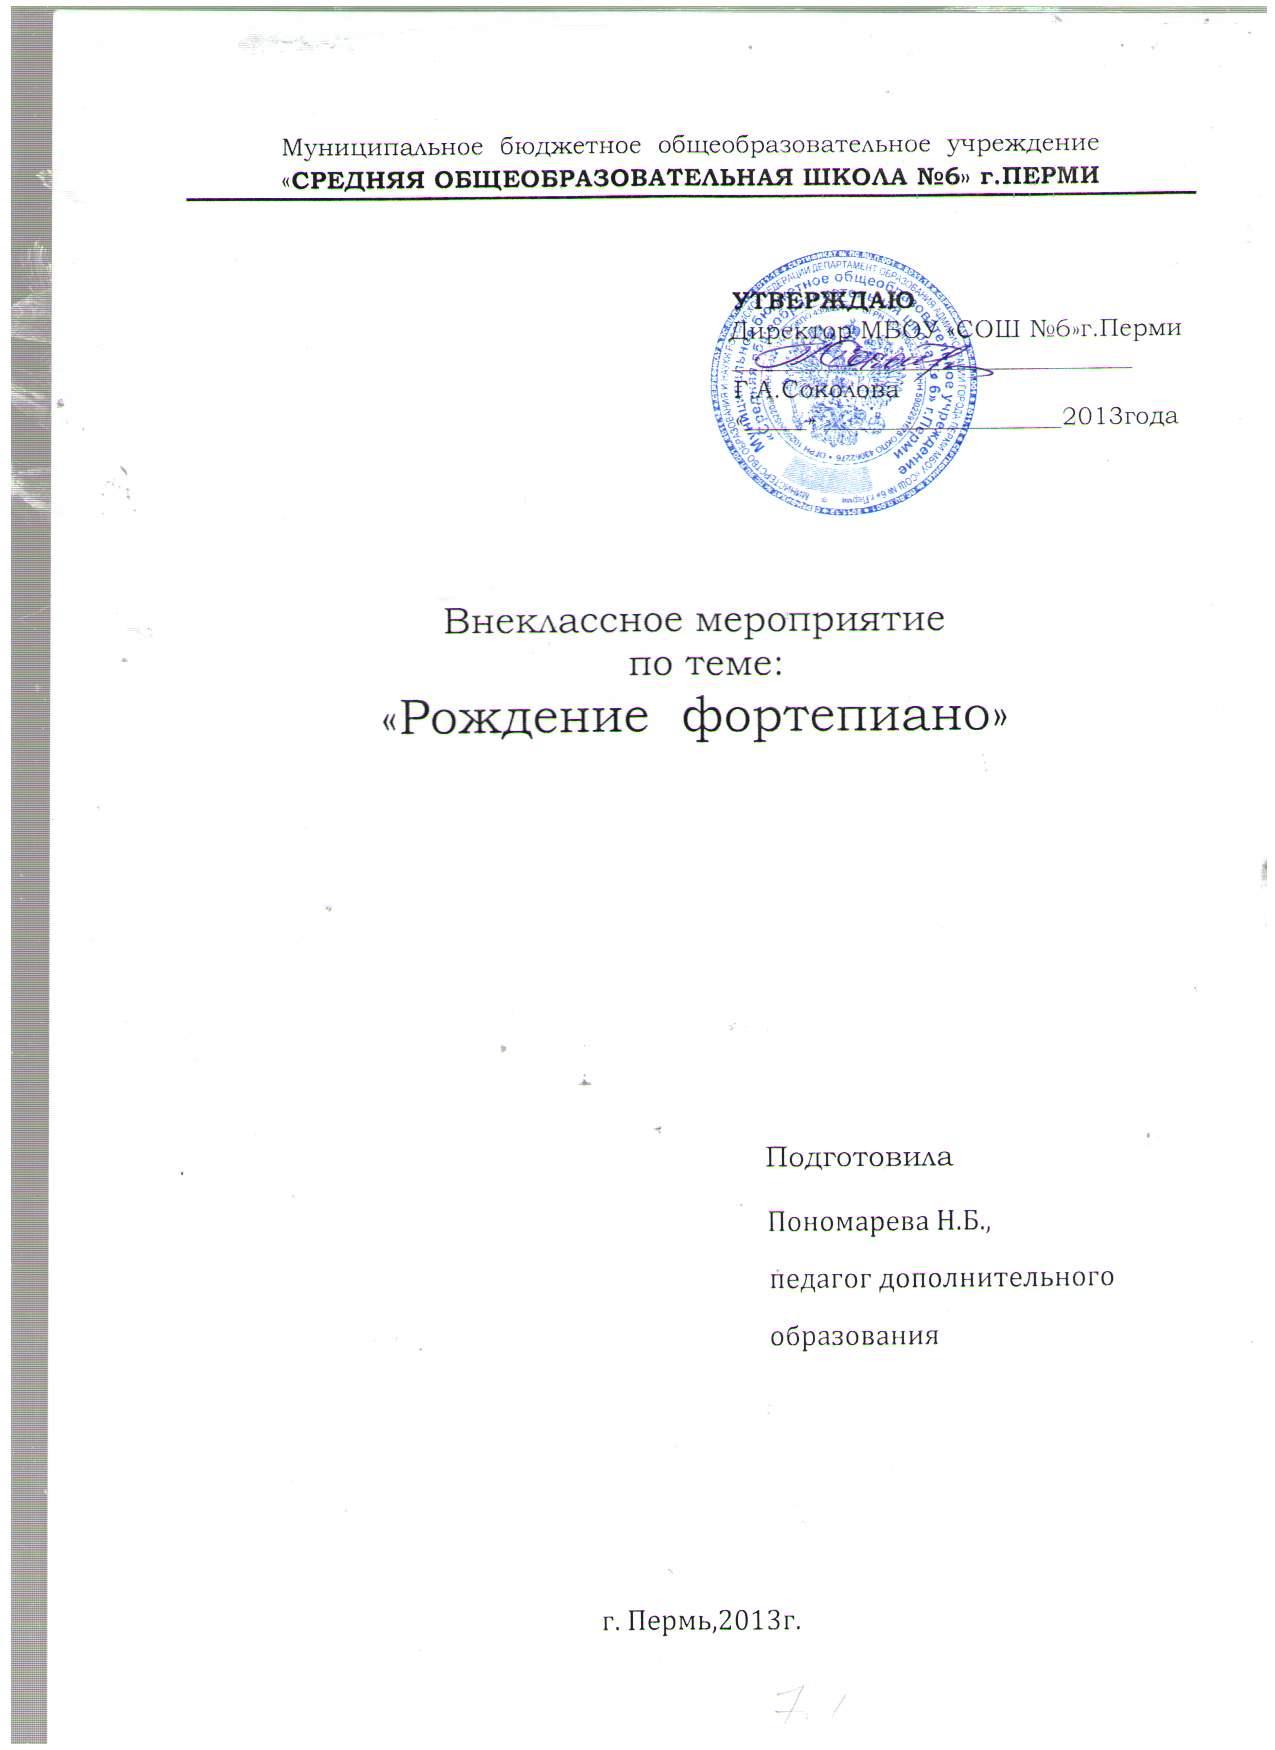 C:\Users\Нина\Desktop\Пономарева\внекл4.jpg